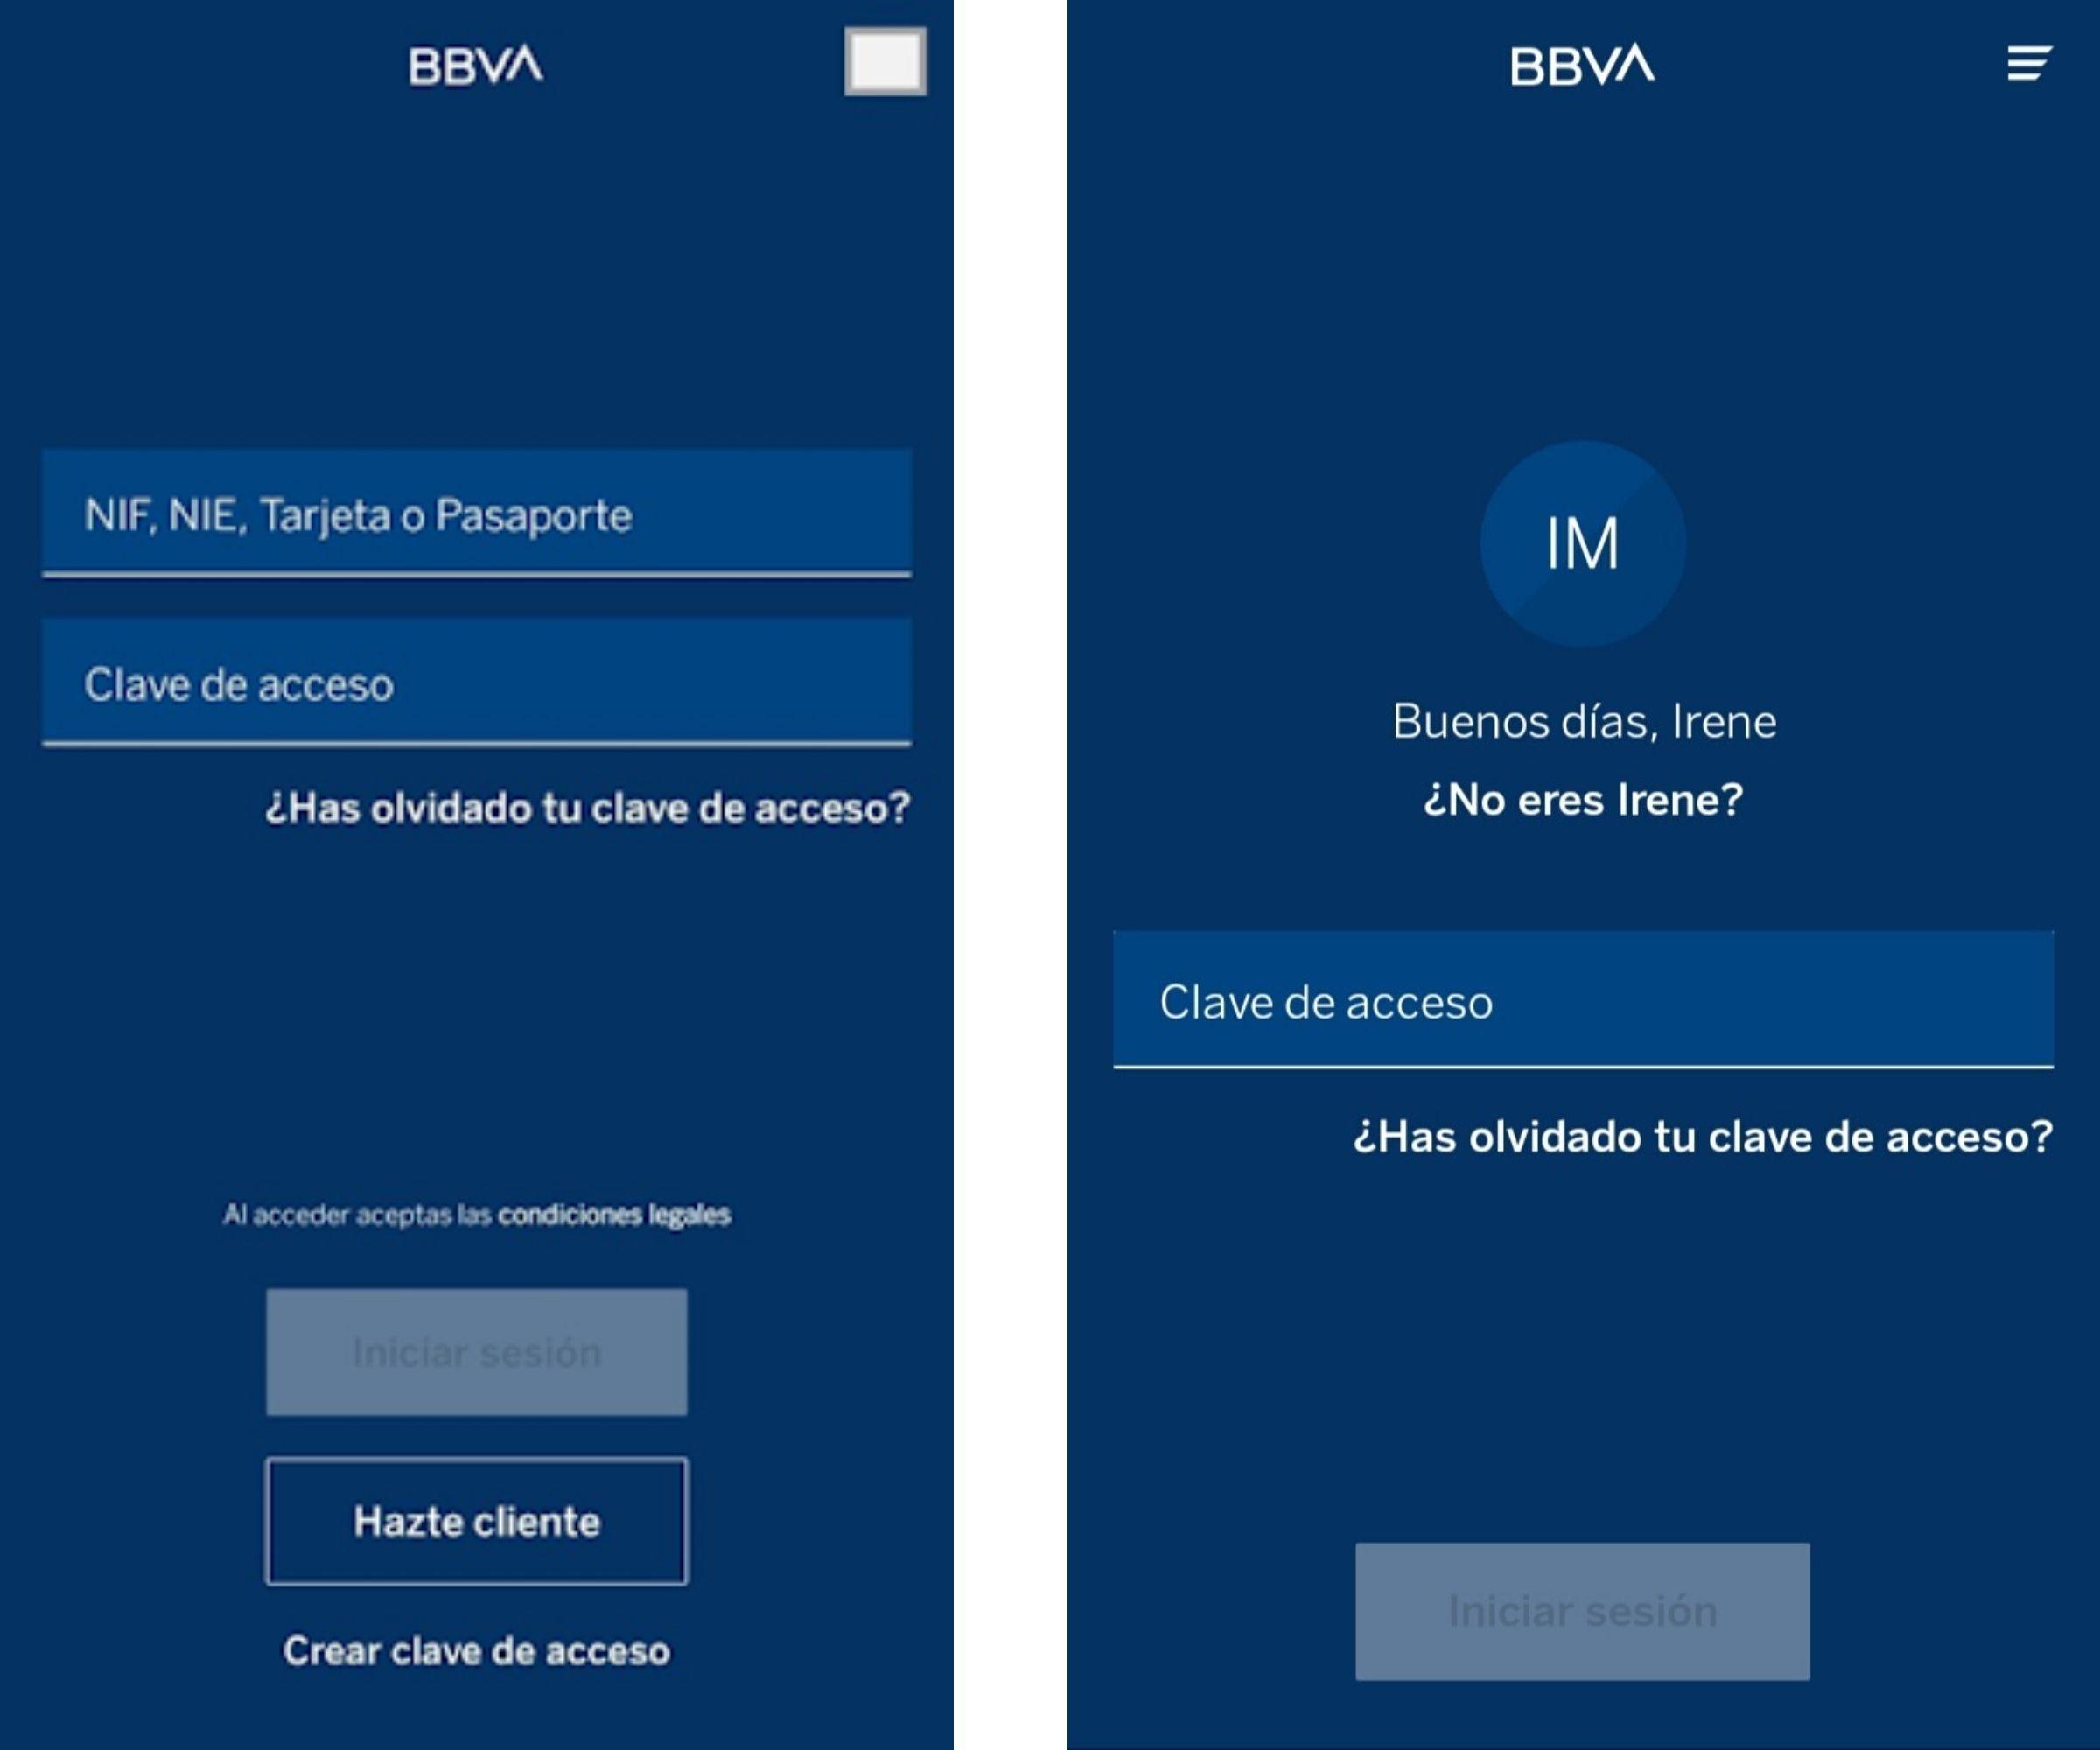 malware app bbva